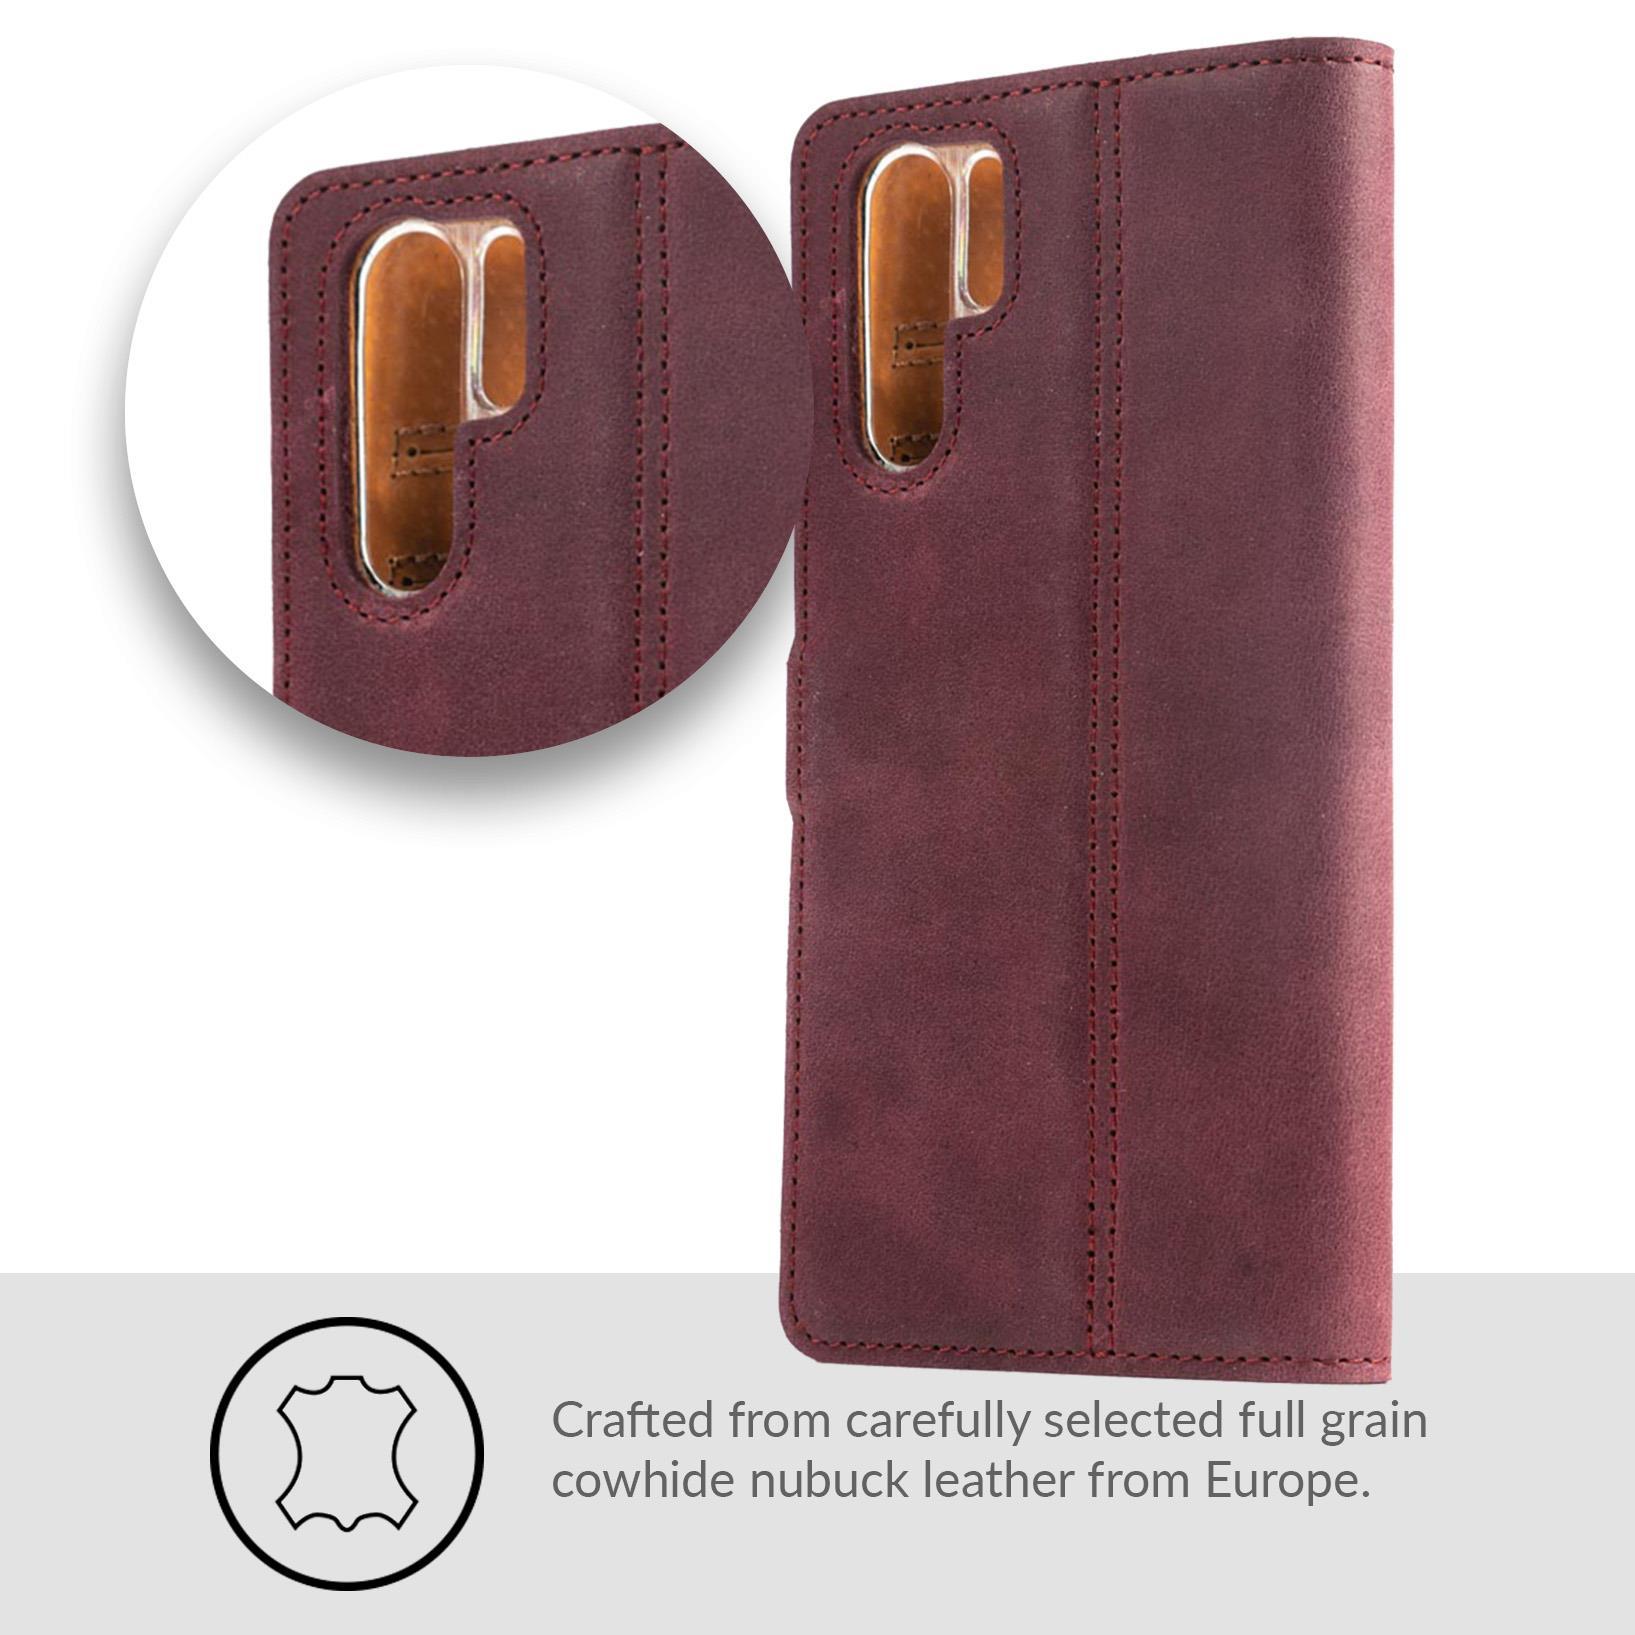 Snakehive-Huawei-P30-Pro-Premium-Genuine-Leather-Wallet-Case-w-Card-Slots thumbnail 15